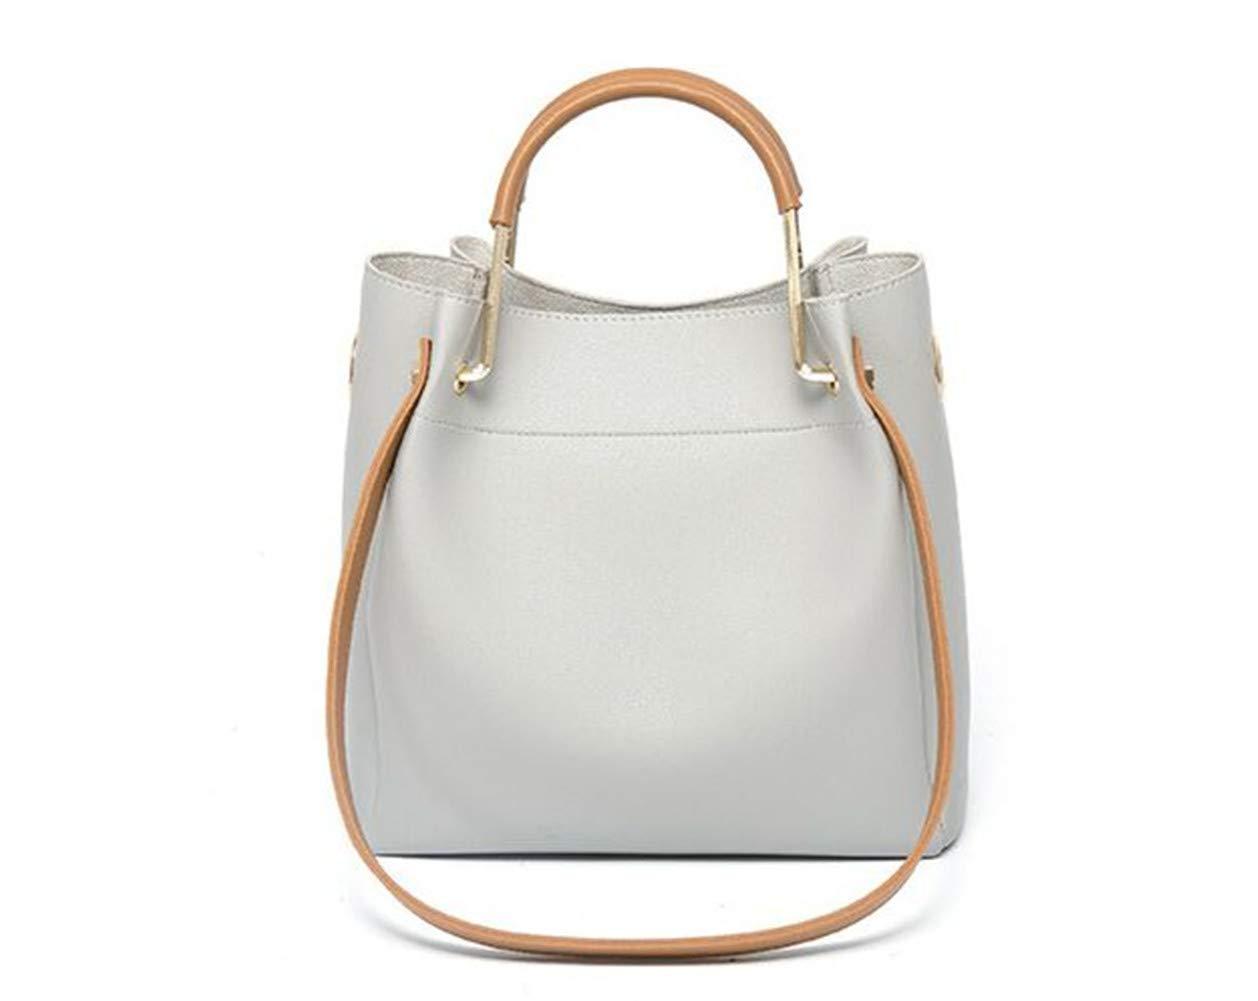 FTSUCQ Womens/Big Girls Bucket Satchels Shoulder Handbags Casual Messenger Bag Hobos Satchels Purse (Gray)